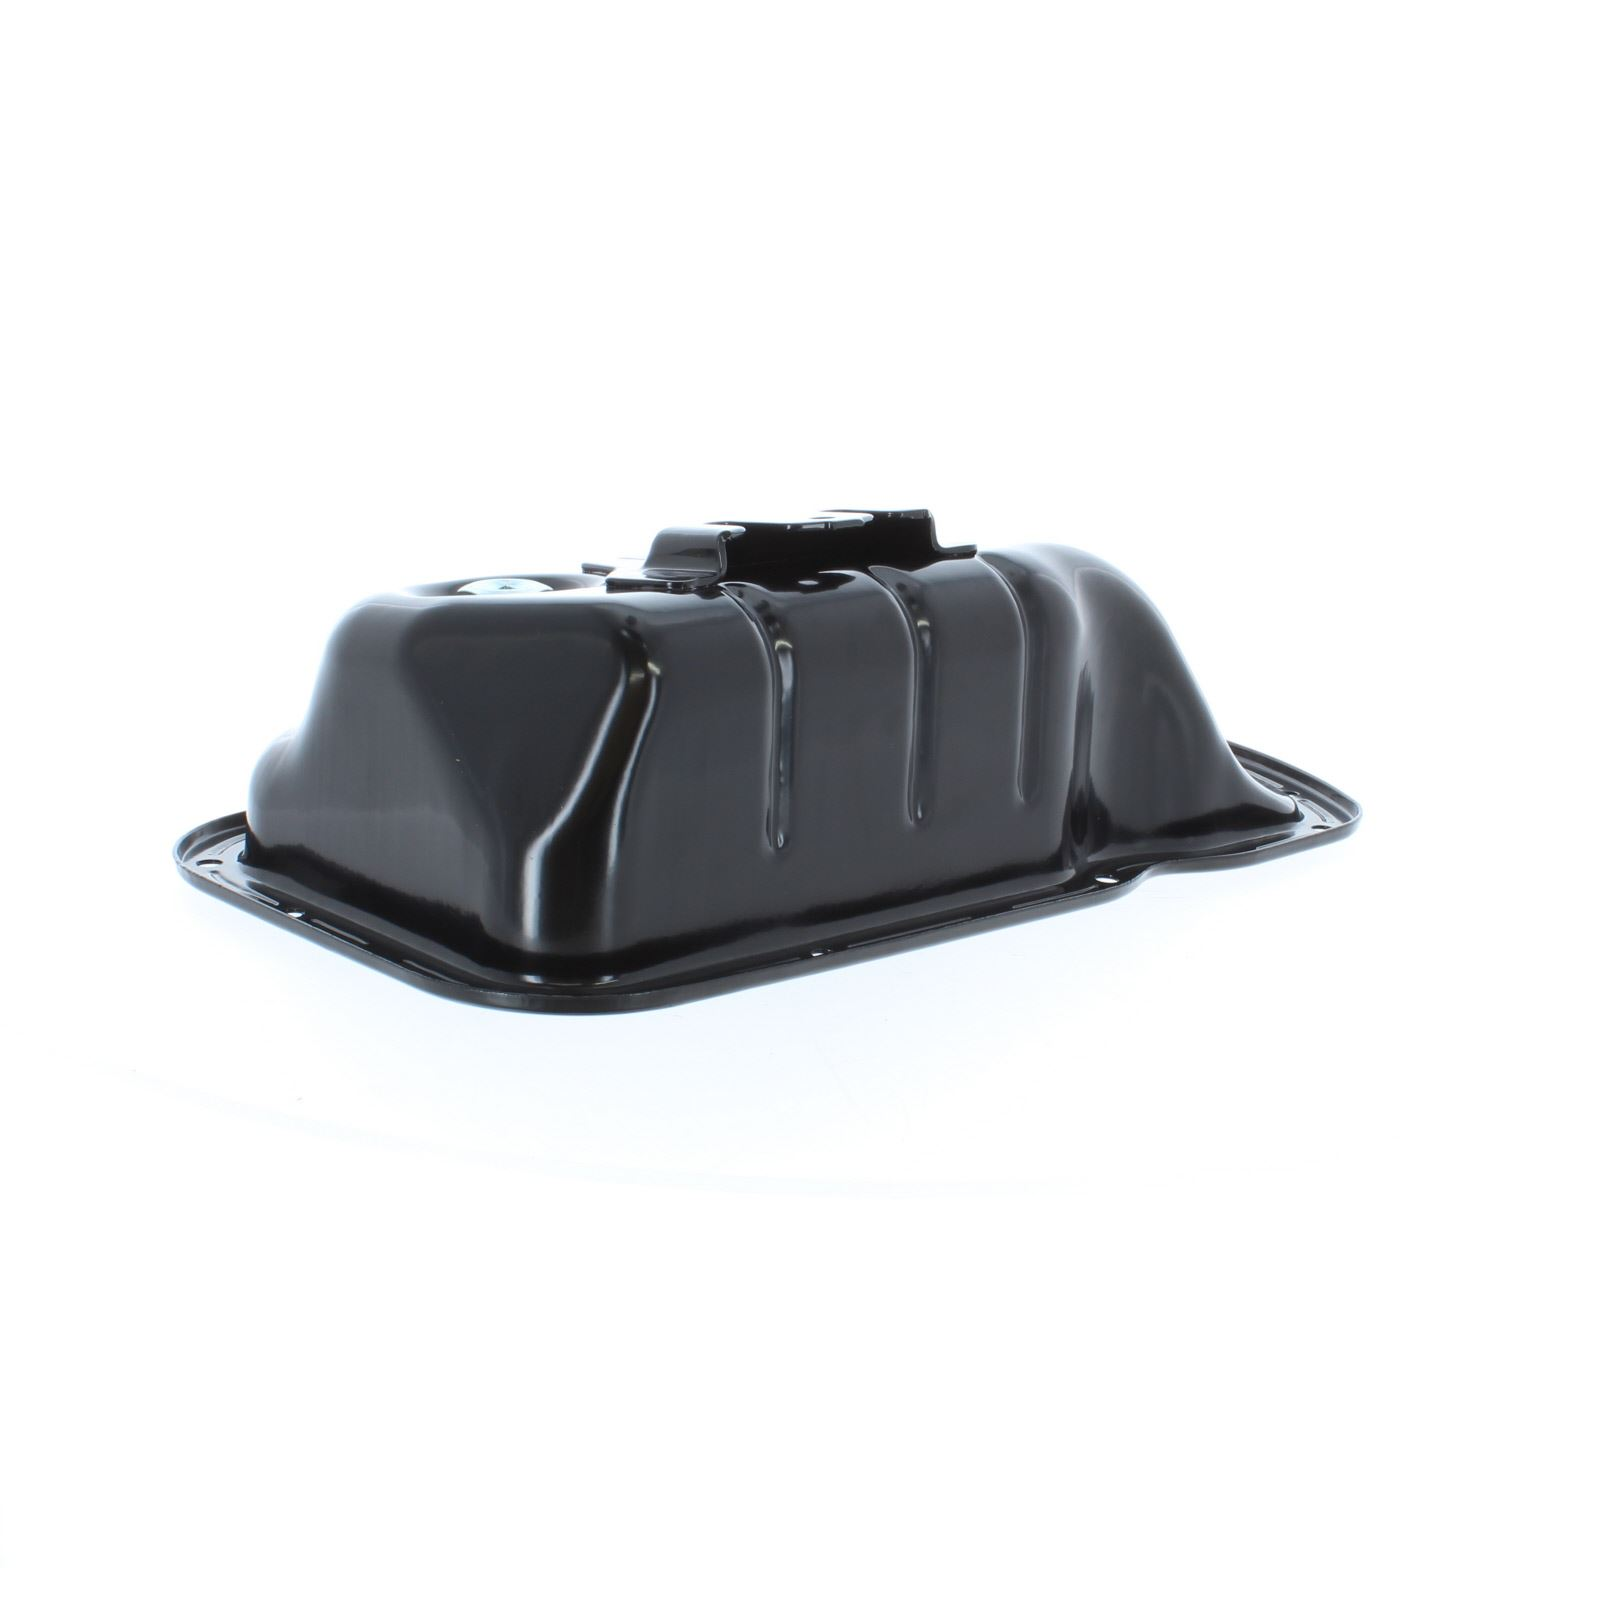 CITROEN C2 2003-2010 1.4L PETROL ENGINE SUMP STEEL PAN INC BRACKET